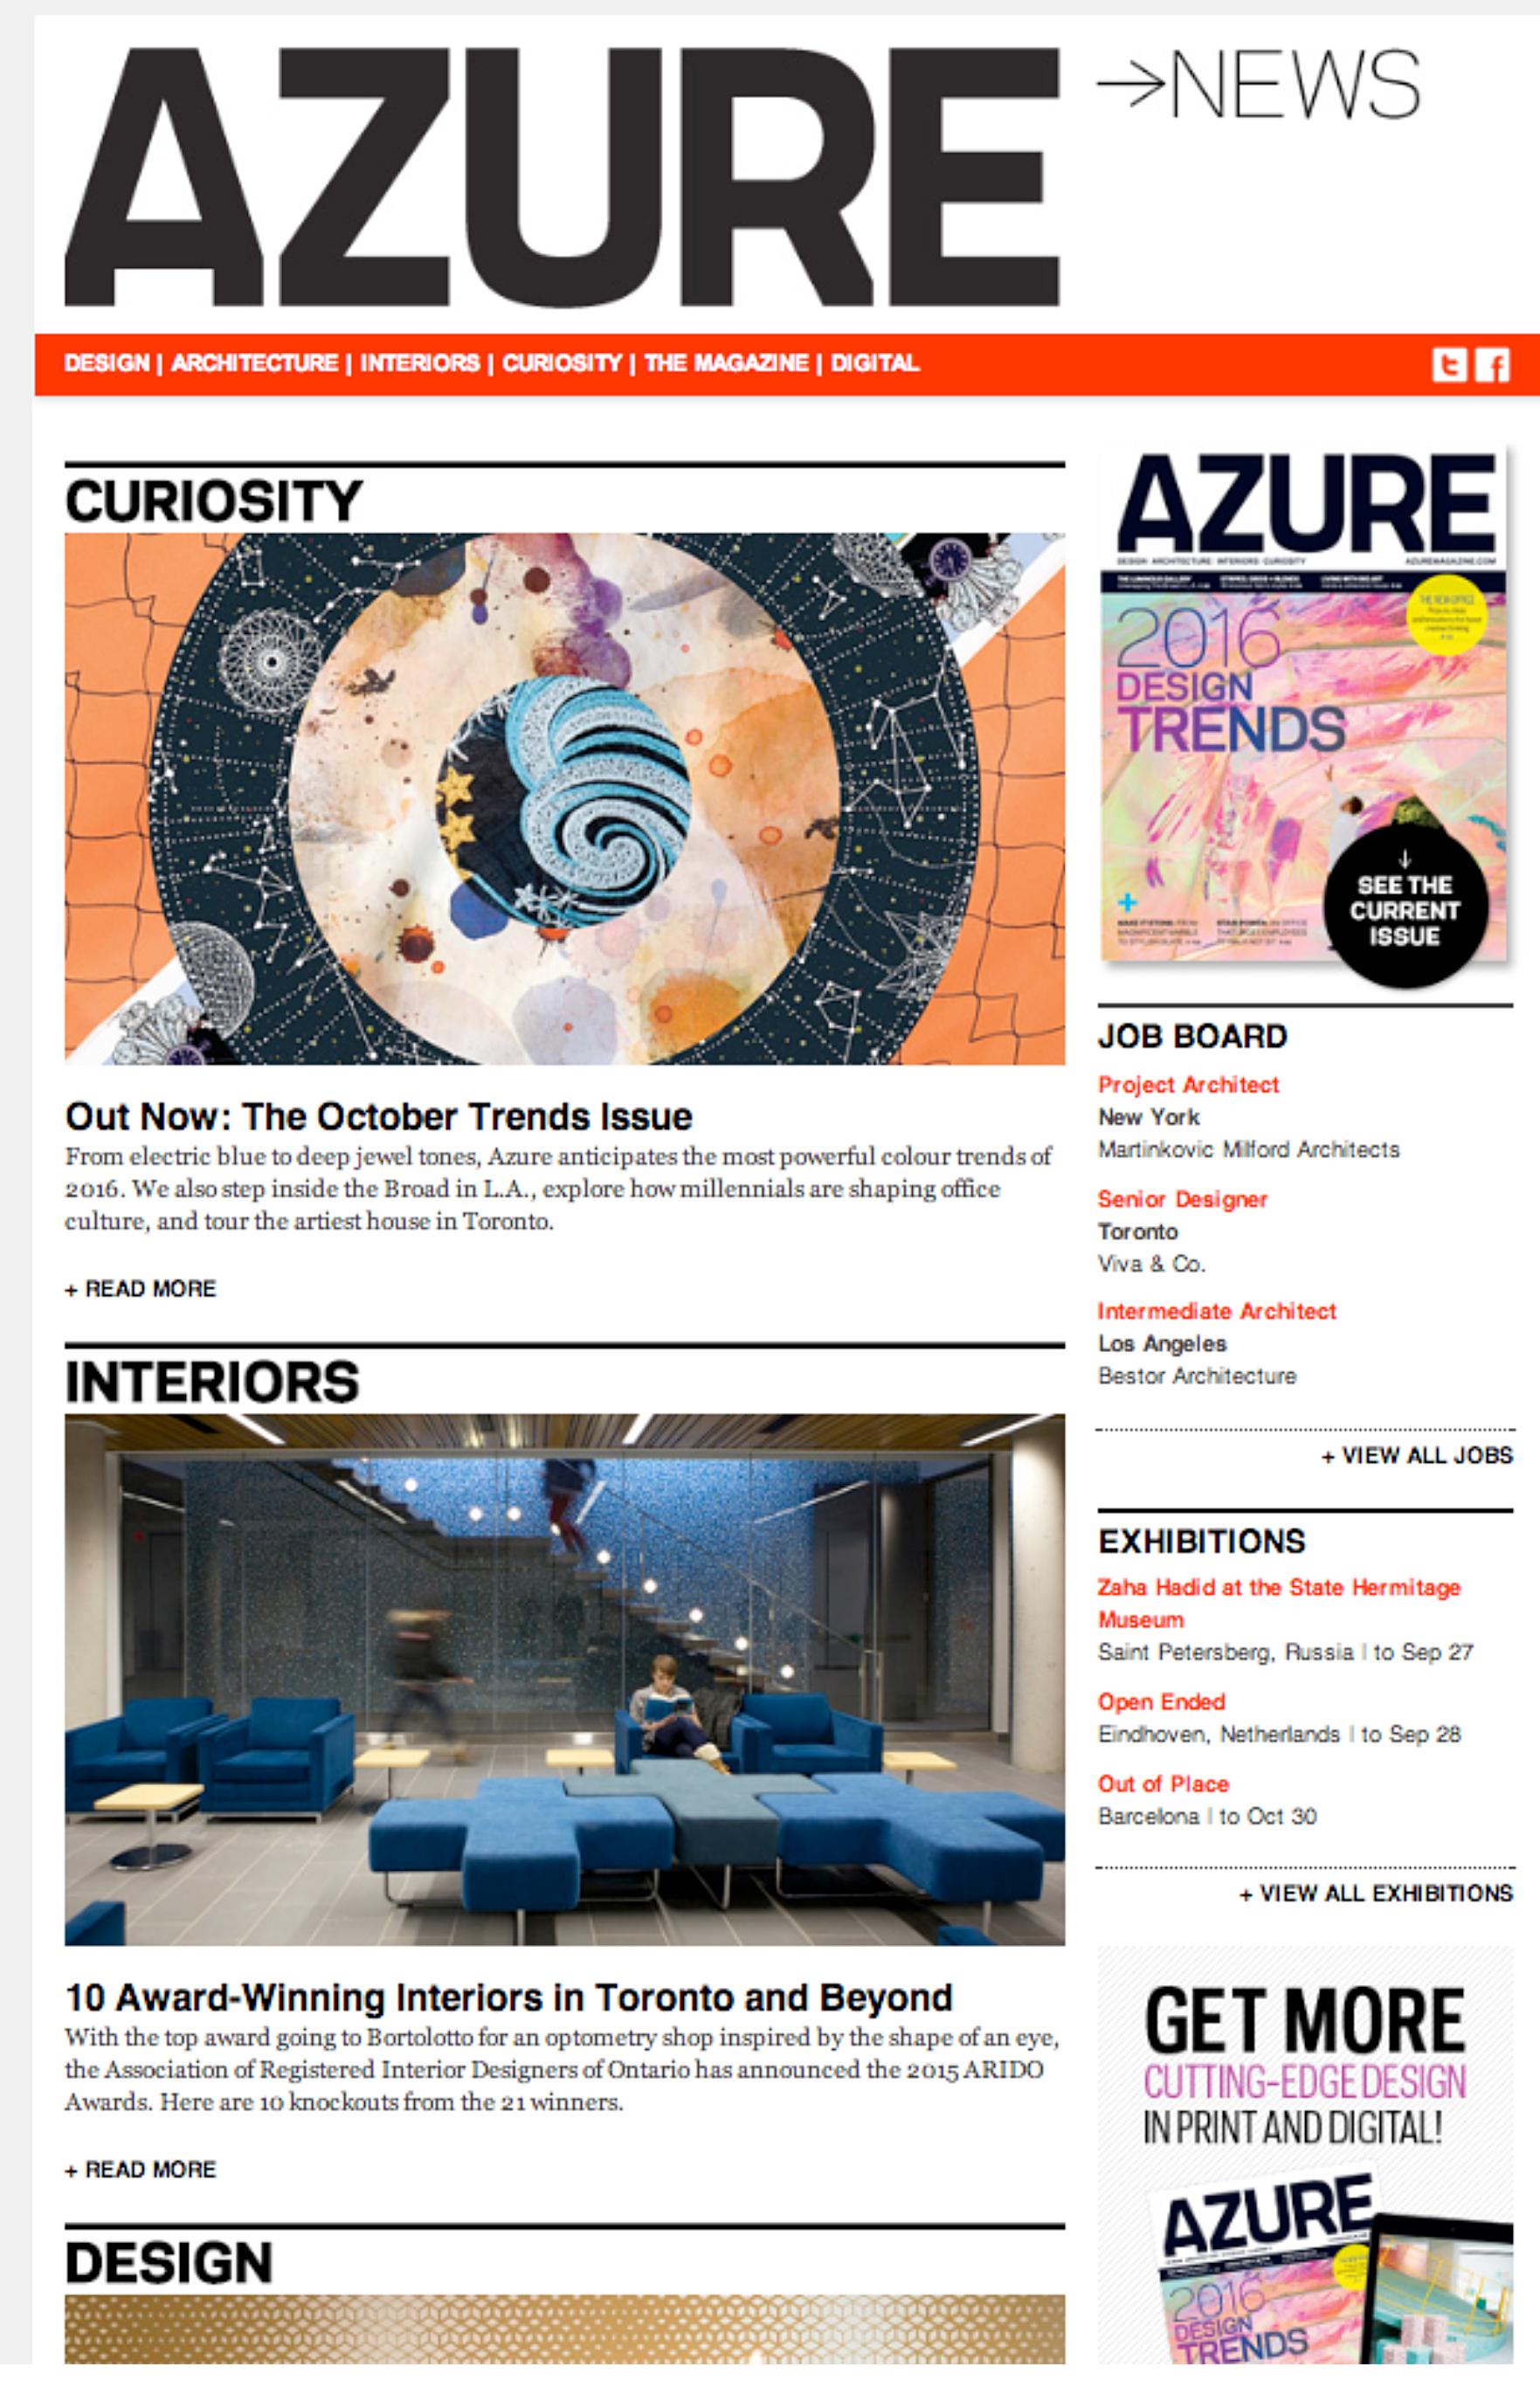 http://www.azuremagazine.com/article/2015-arido-award-winners/